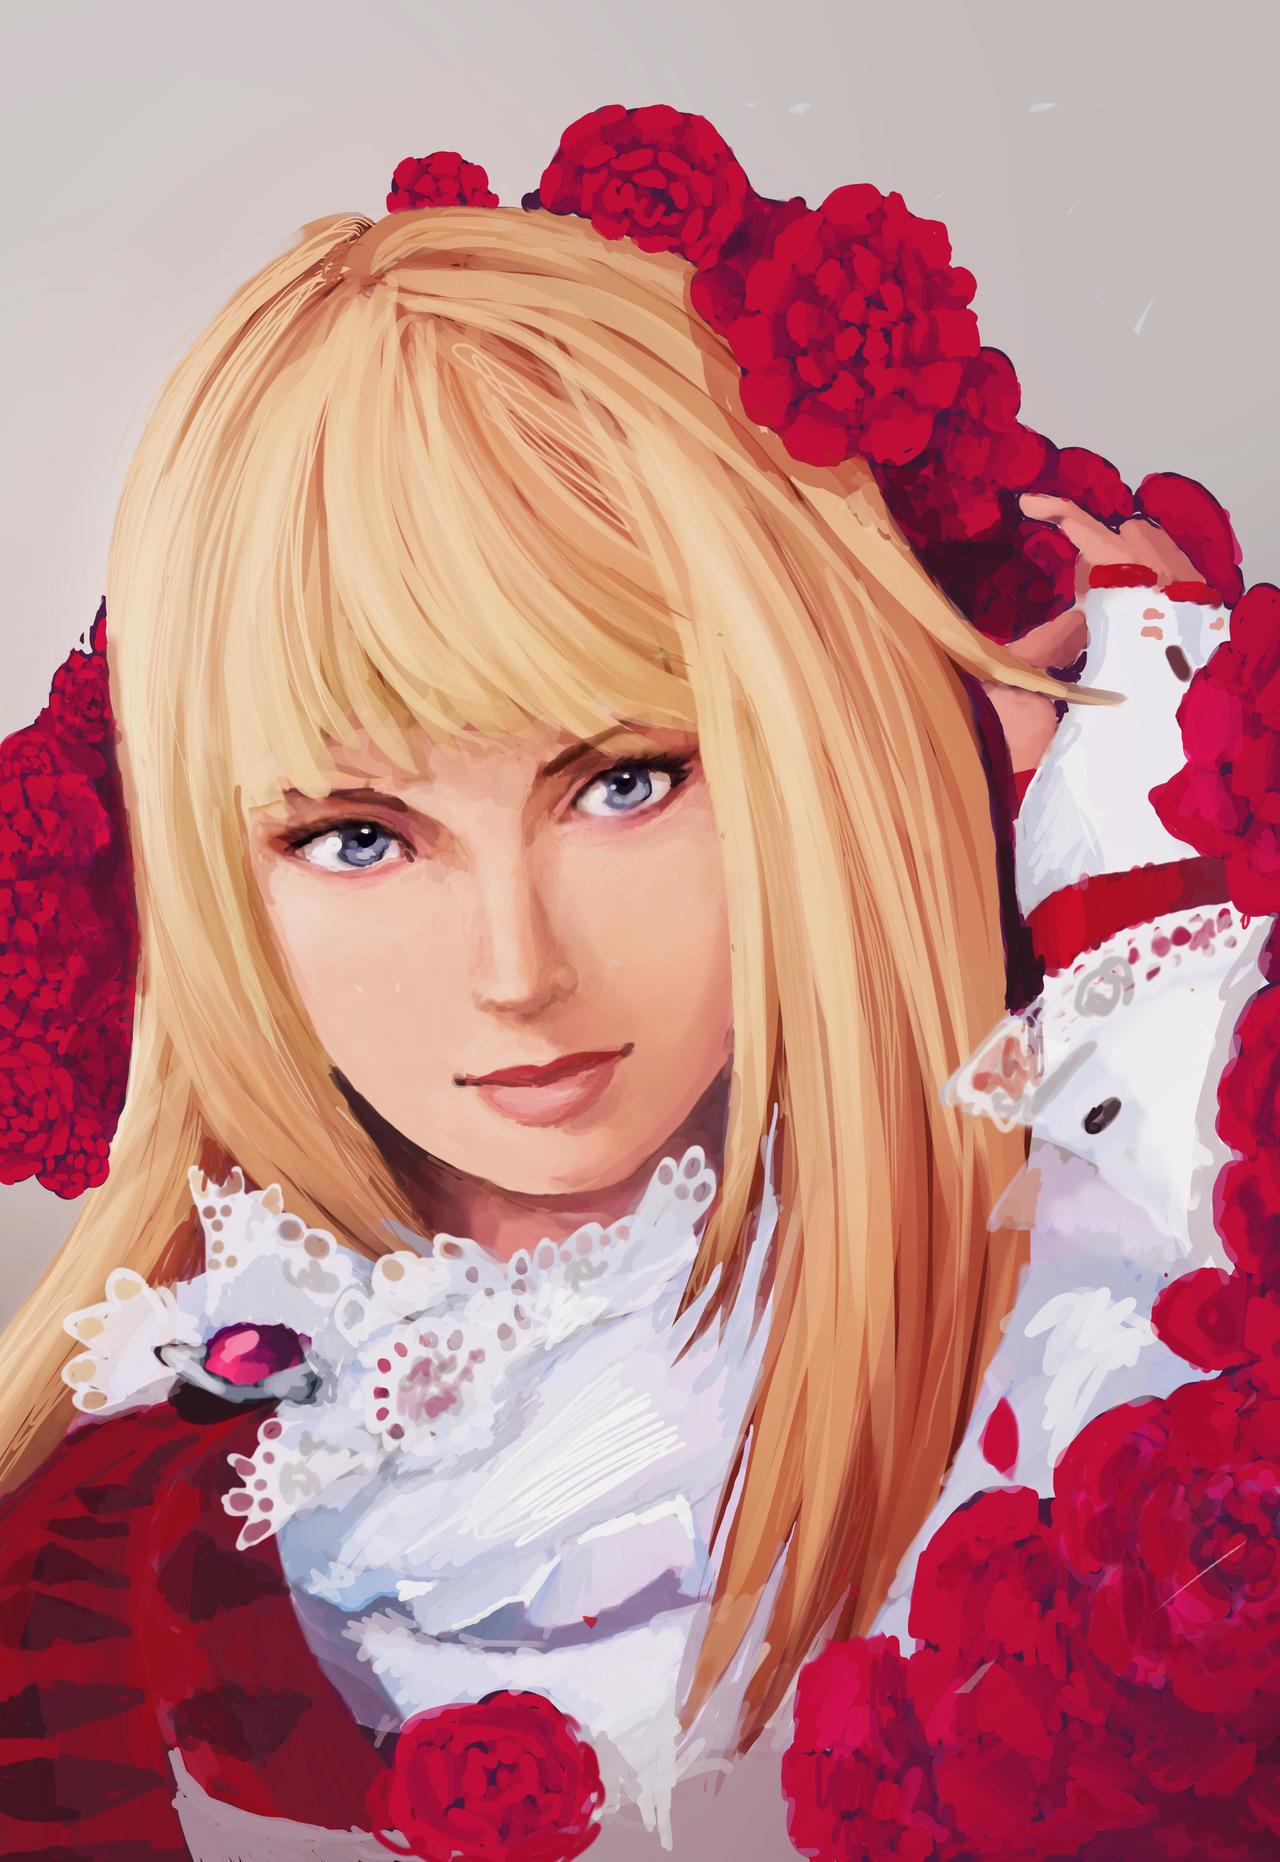 Lili Rochefort from Tekken by SoothSheeper